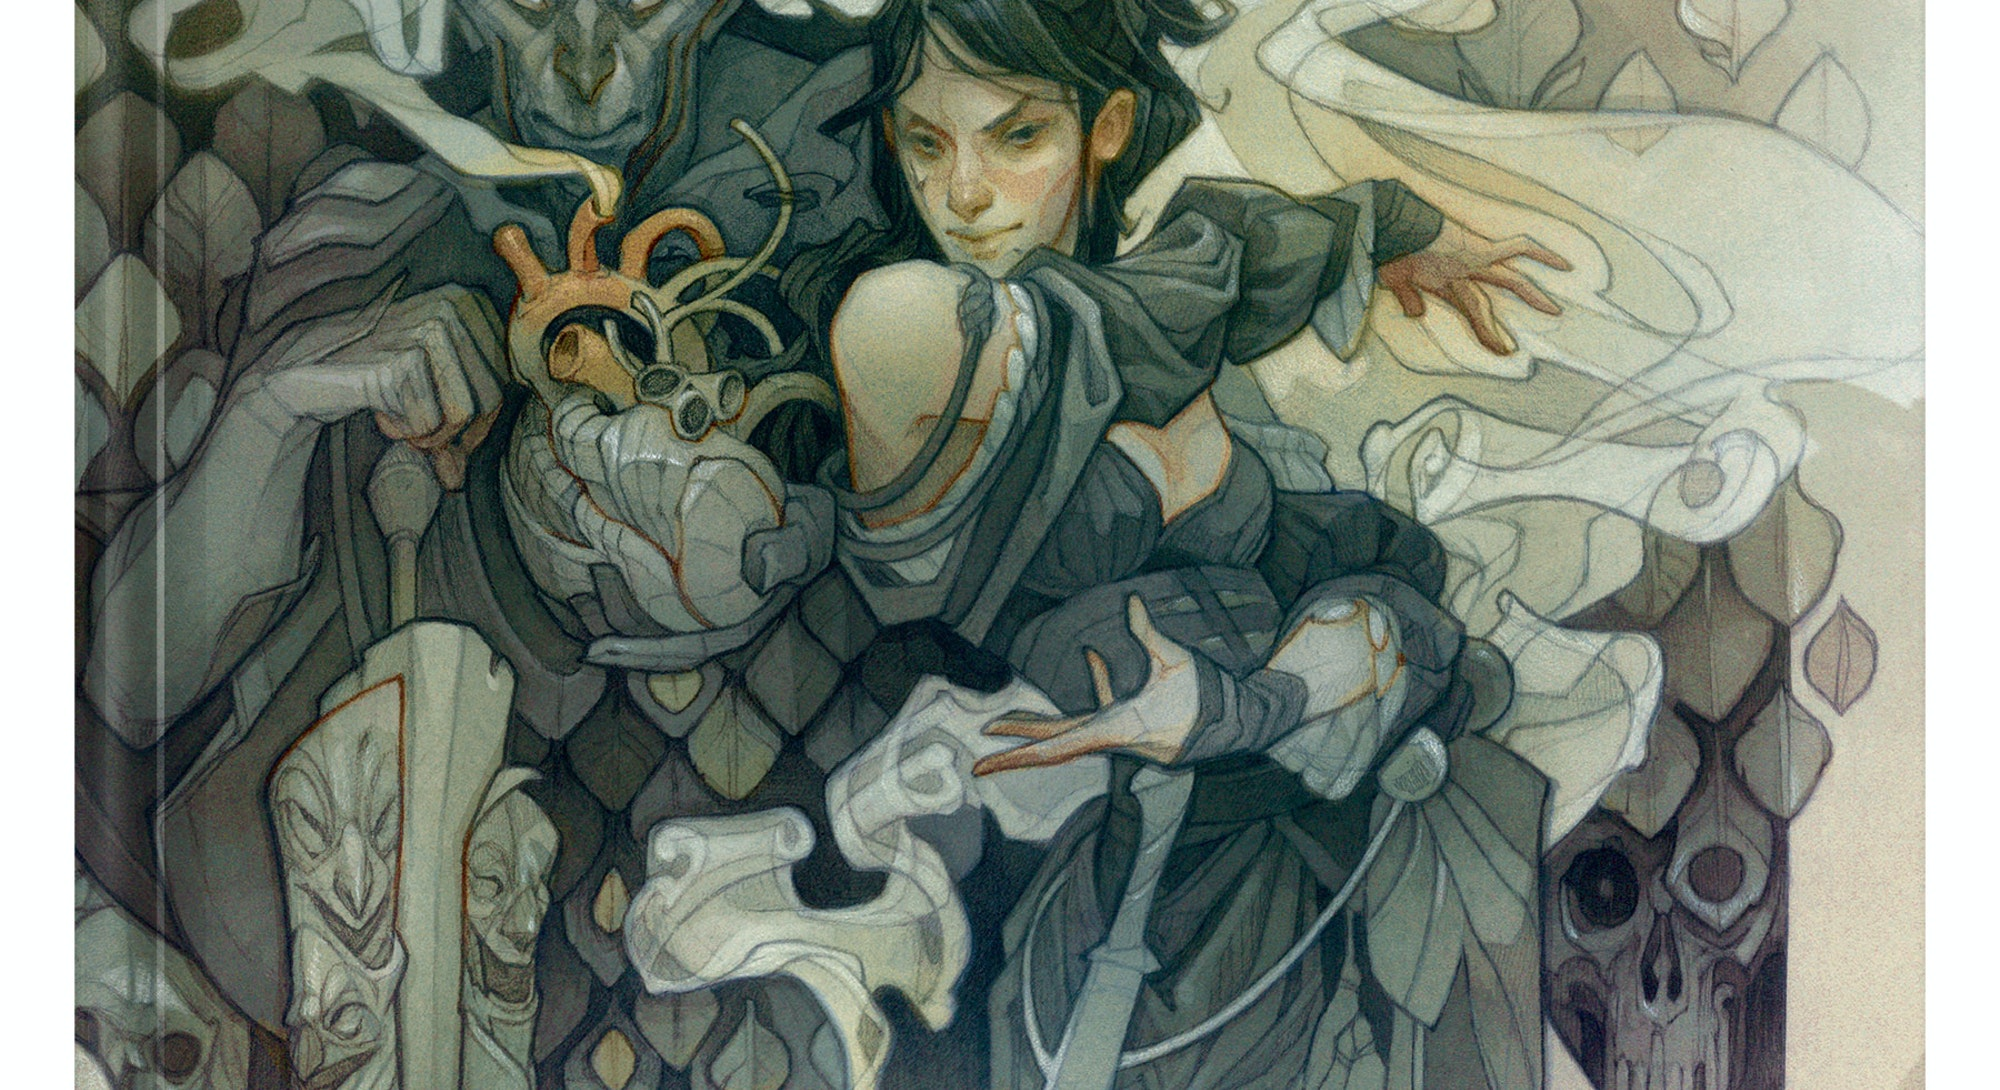 tashas guide to everything alt cover art